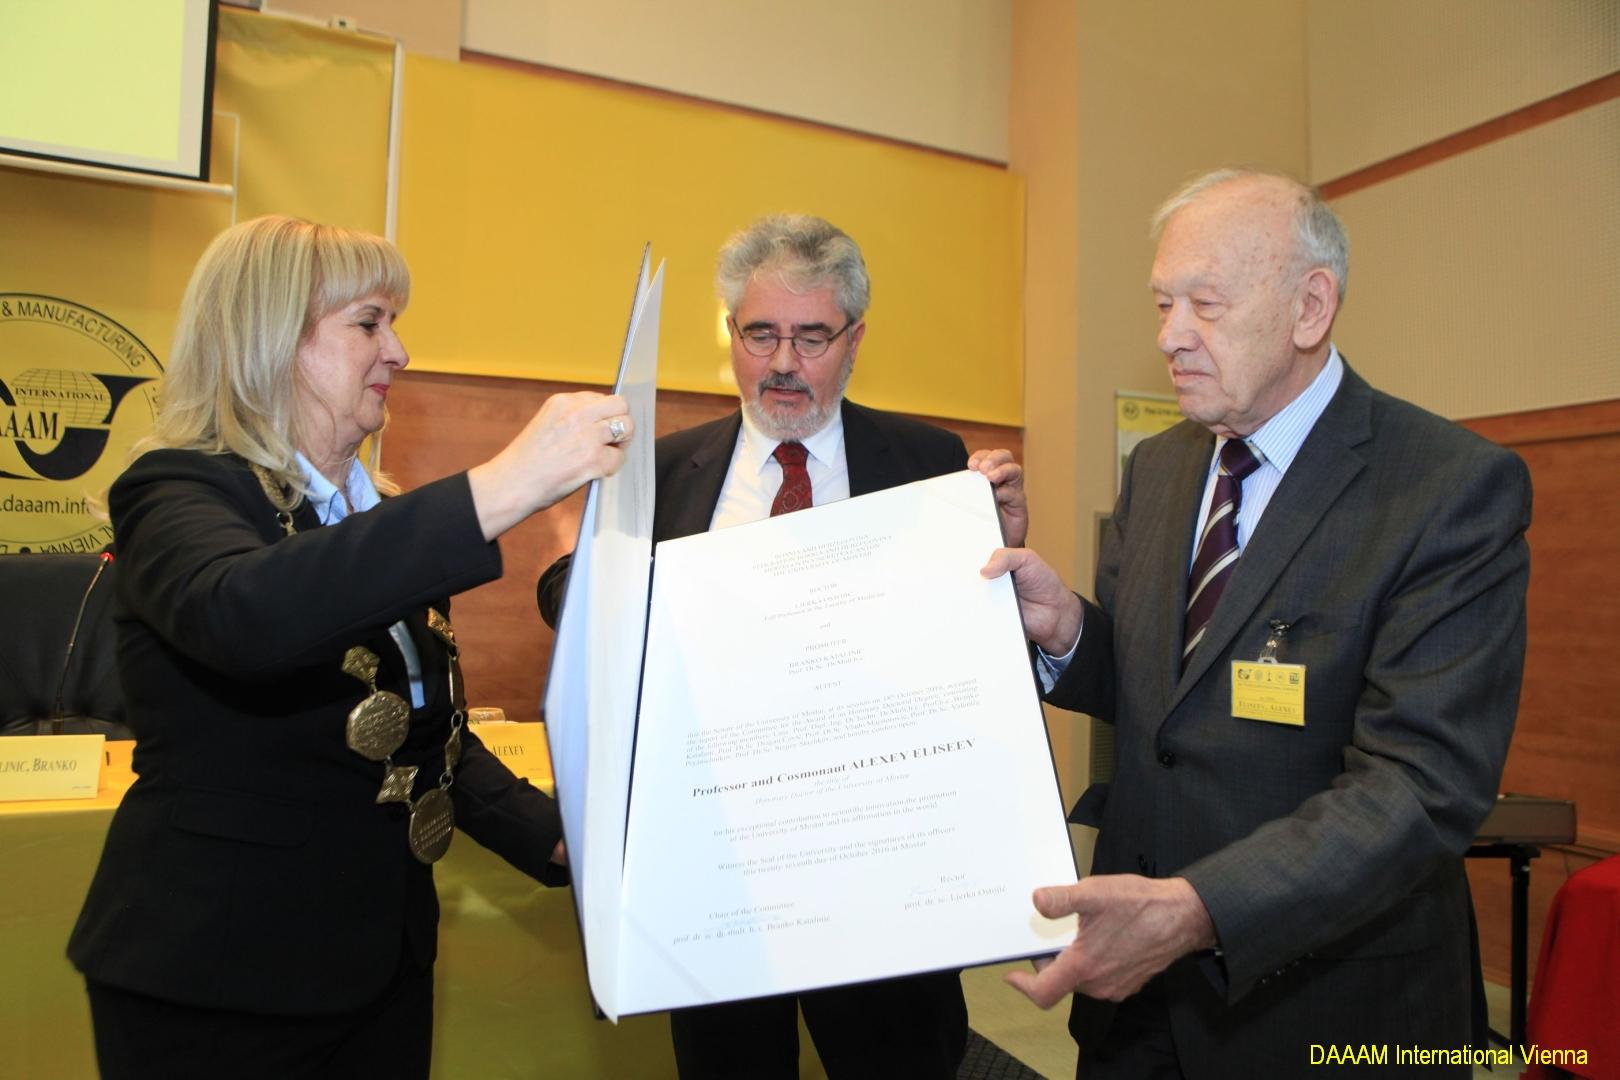 DAAAM_2016_Mostar_06_Professor_and_Cosmonaut_Alexey_Eliseev_Doctor_honors_causa_014